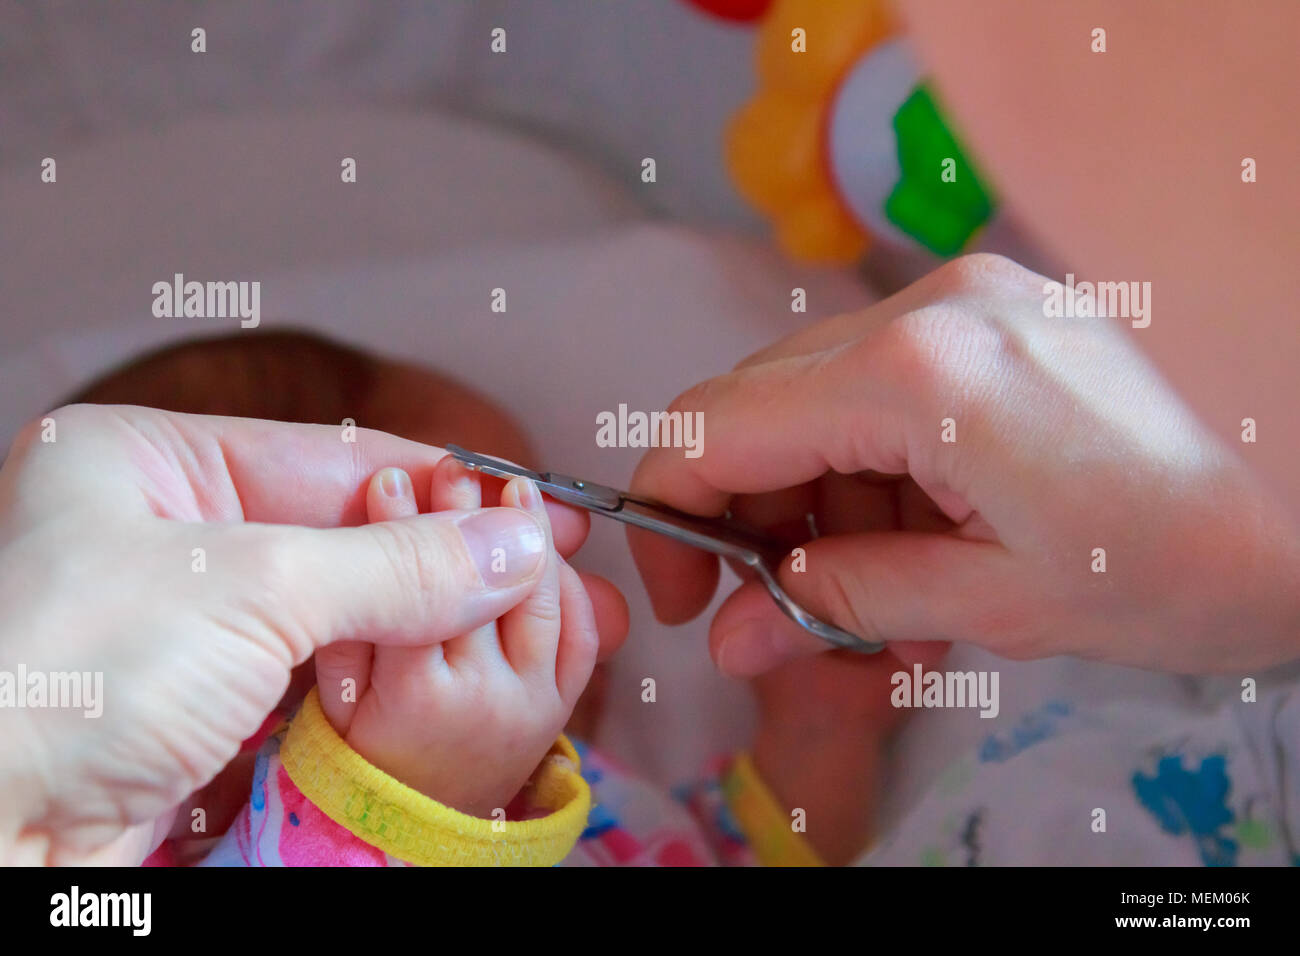 Tolle Nägel Baby Dusche Fotos - Nagellack-Design-Ideen - glennbasso.com